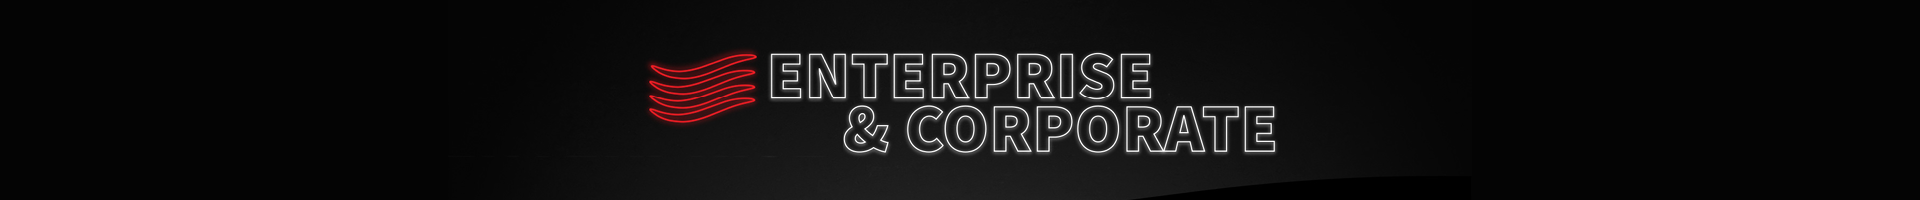 Enterprise Banner